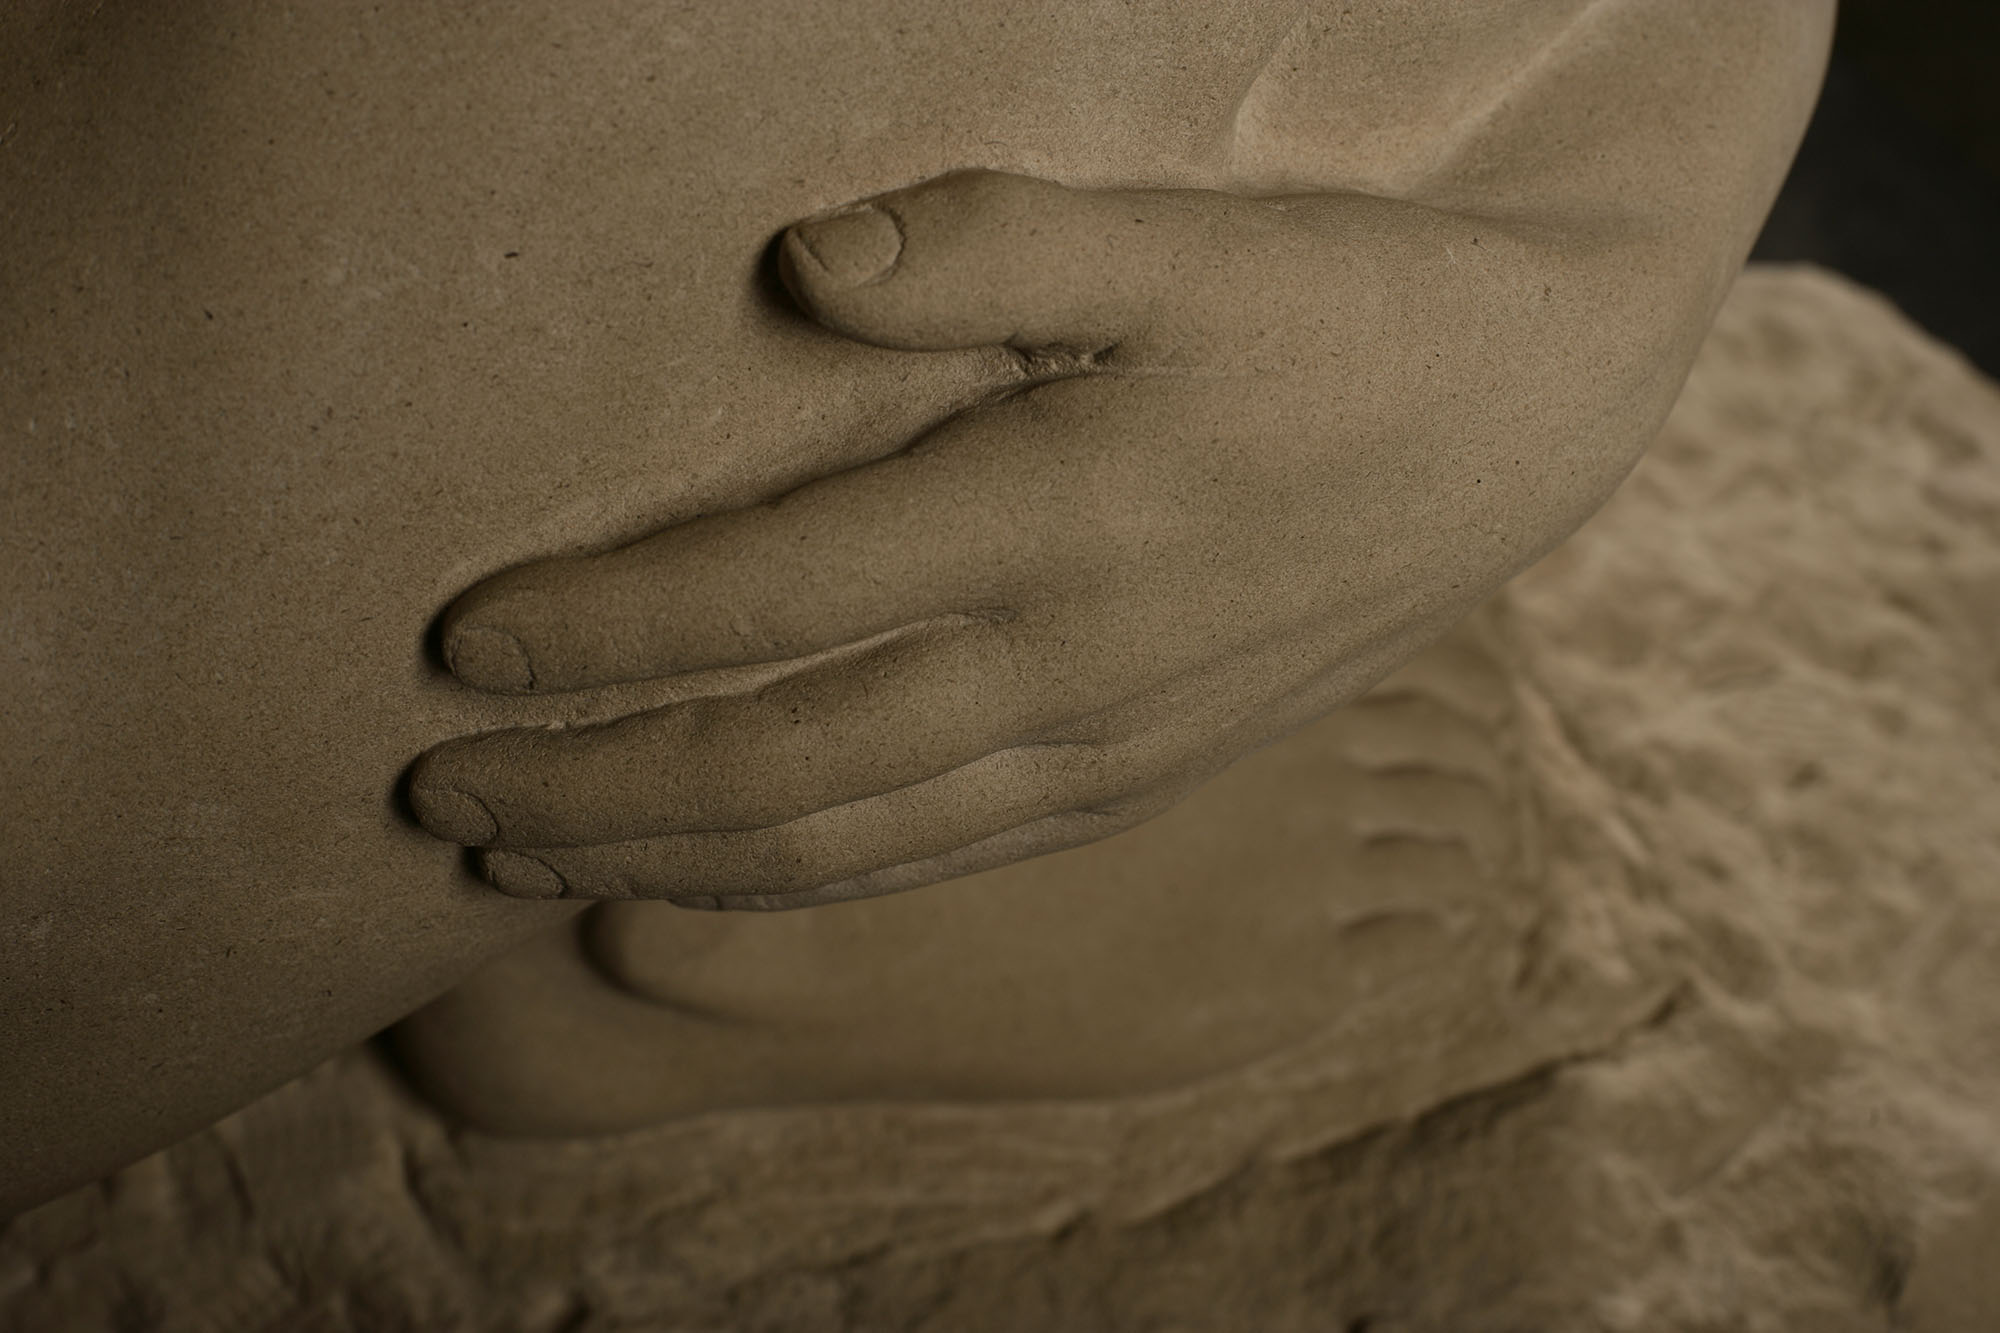 stone crouch85.JPG